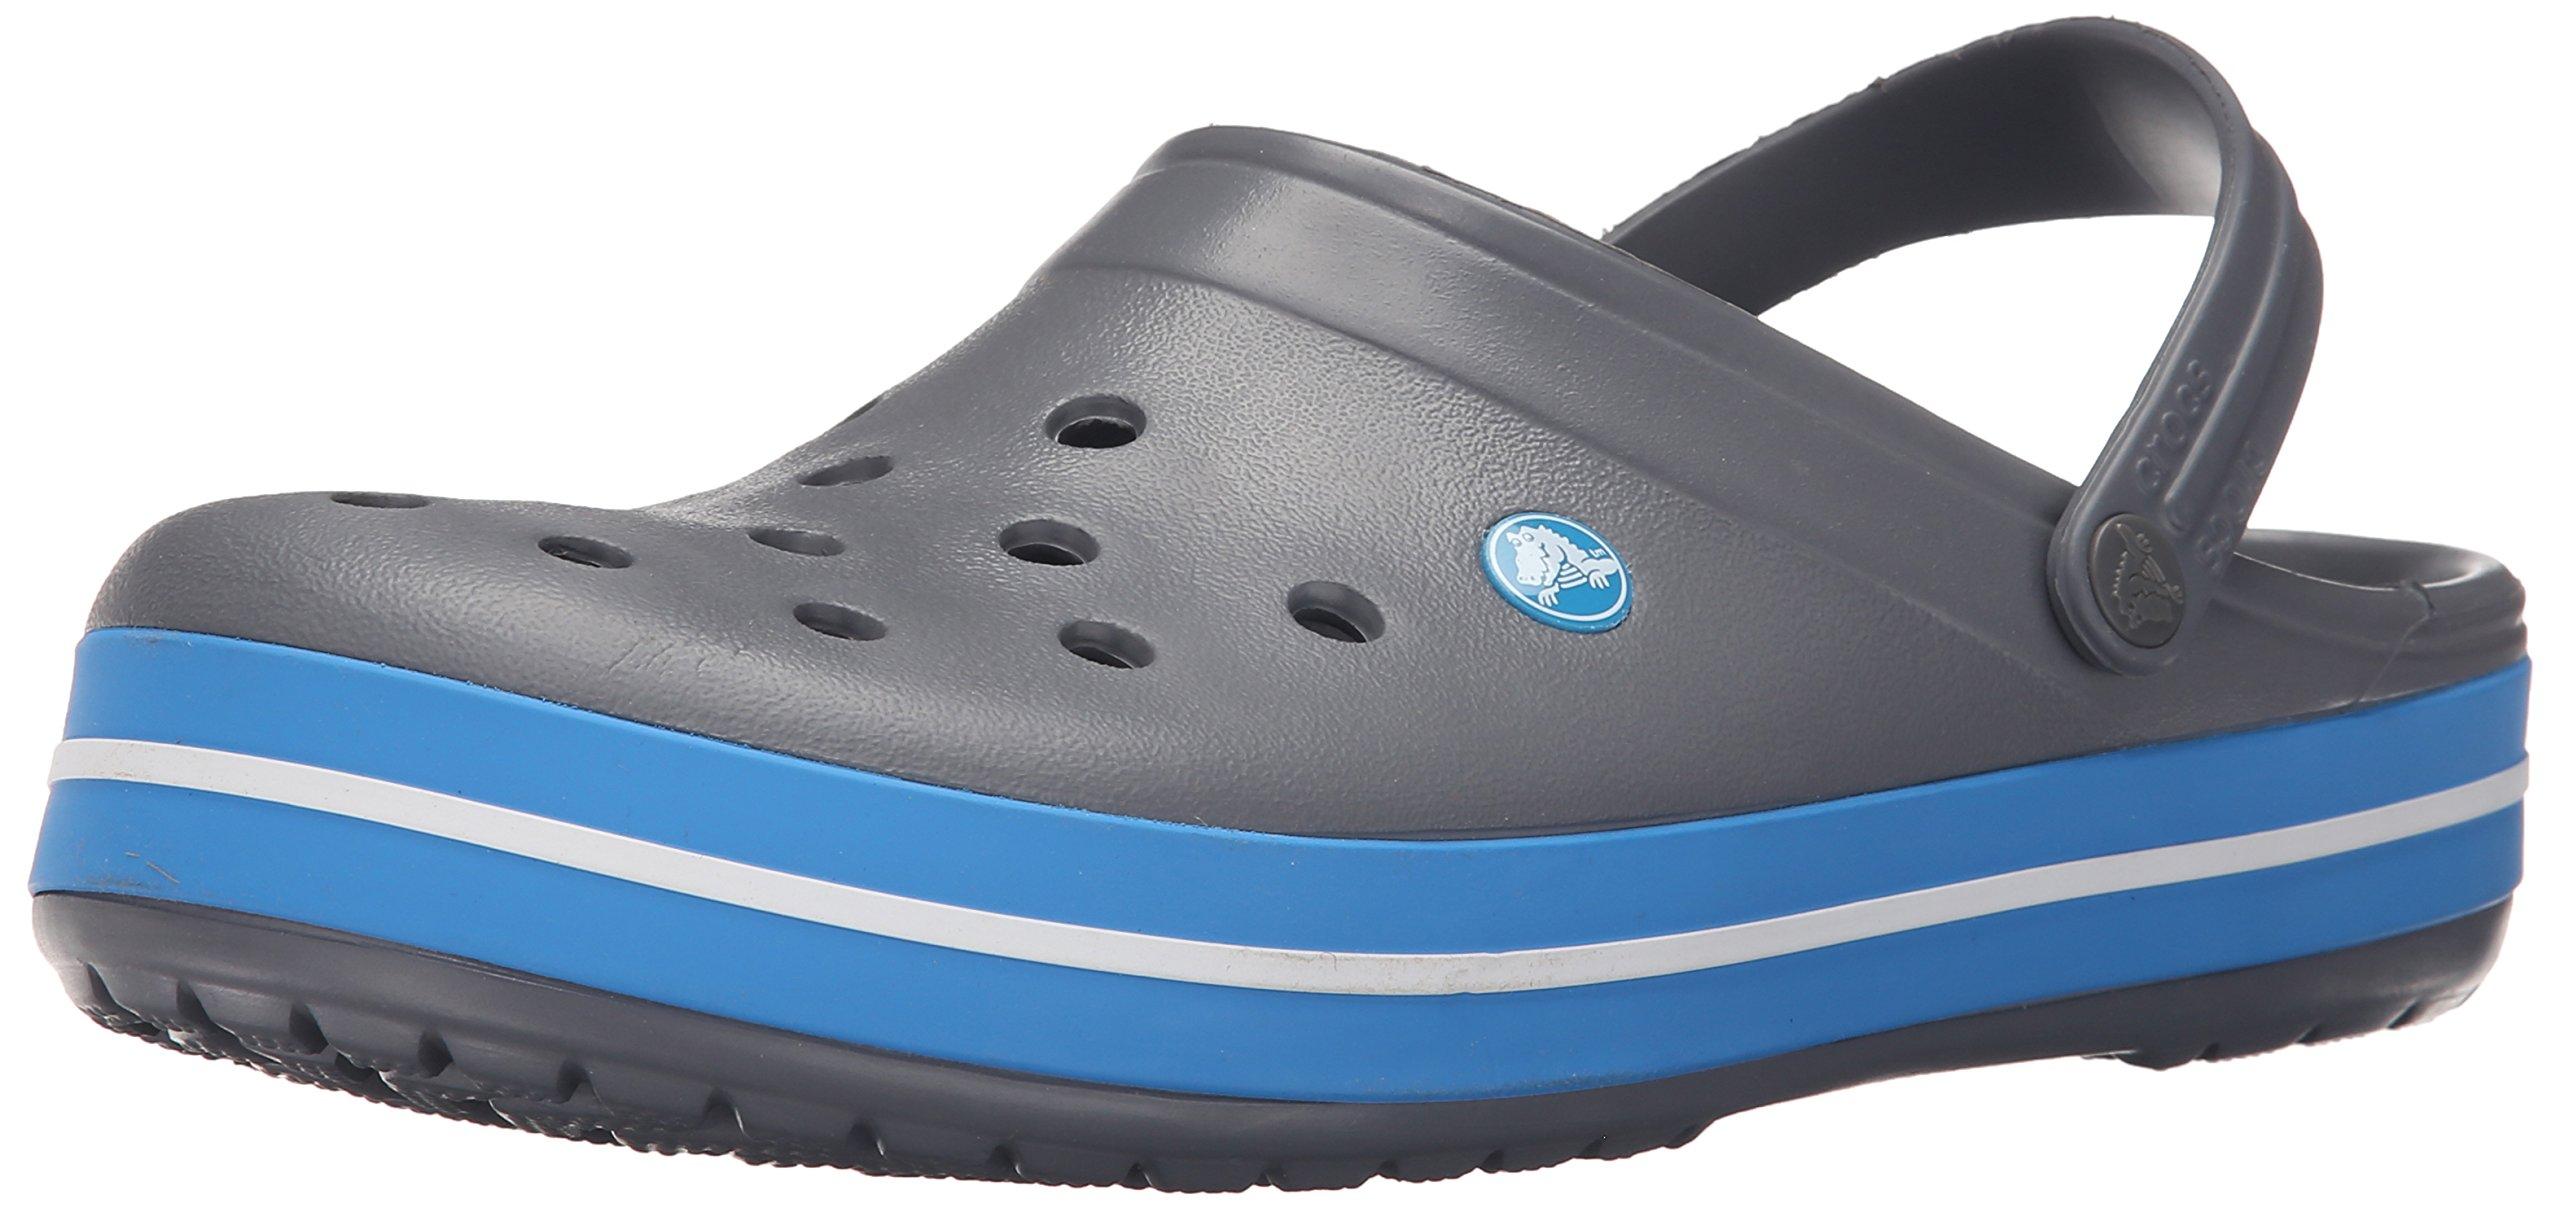 Crocs Unisex Crocband Clog, Charcoal/Ocean, 8 US Men / 10 US Women